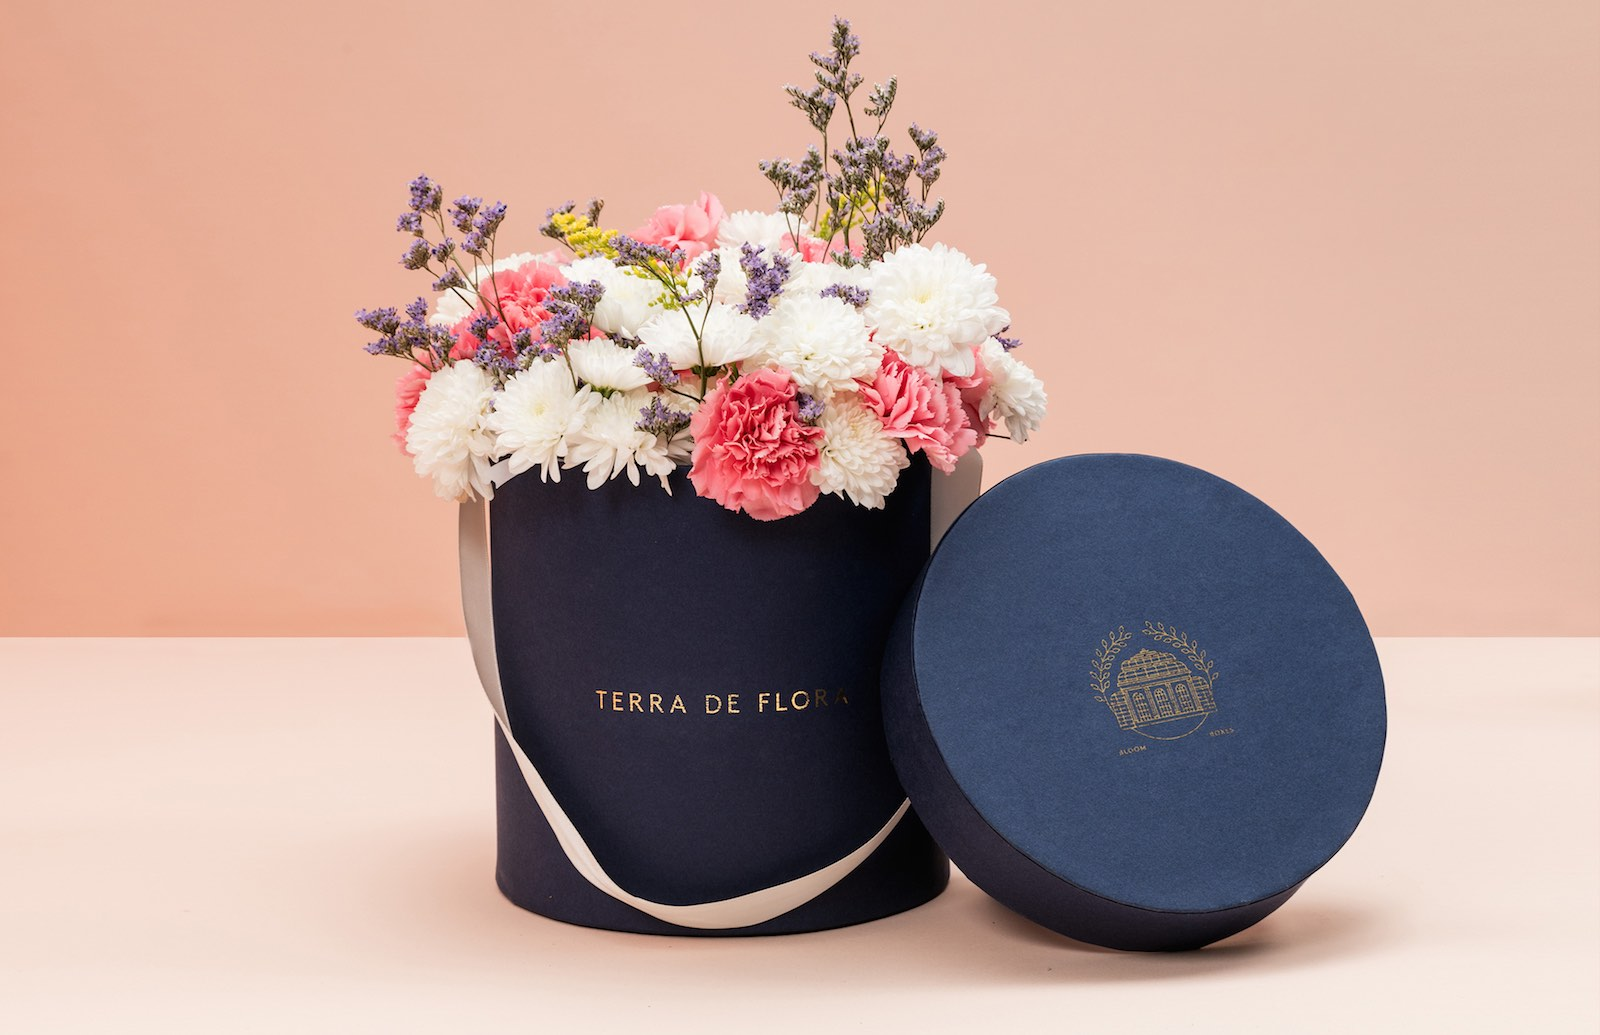 Del branding de Terra de Flora se encargó Parámetro Studio. Foto: parametrostudio.com